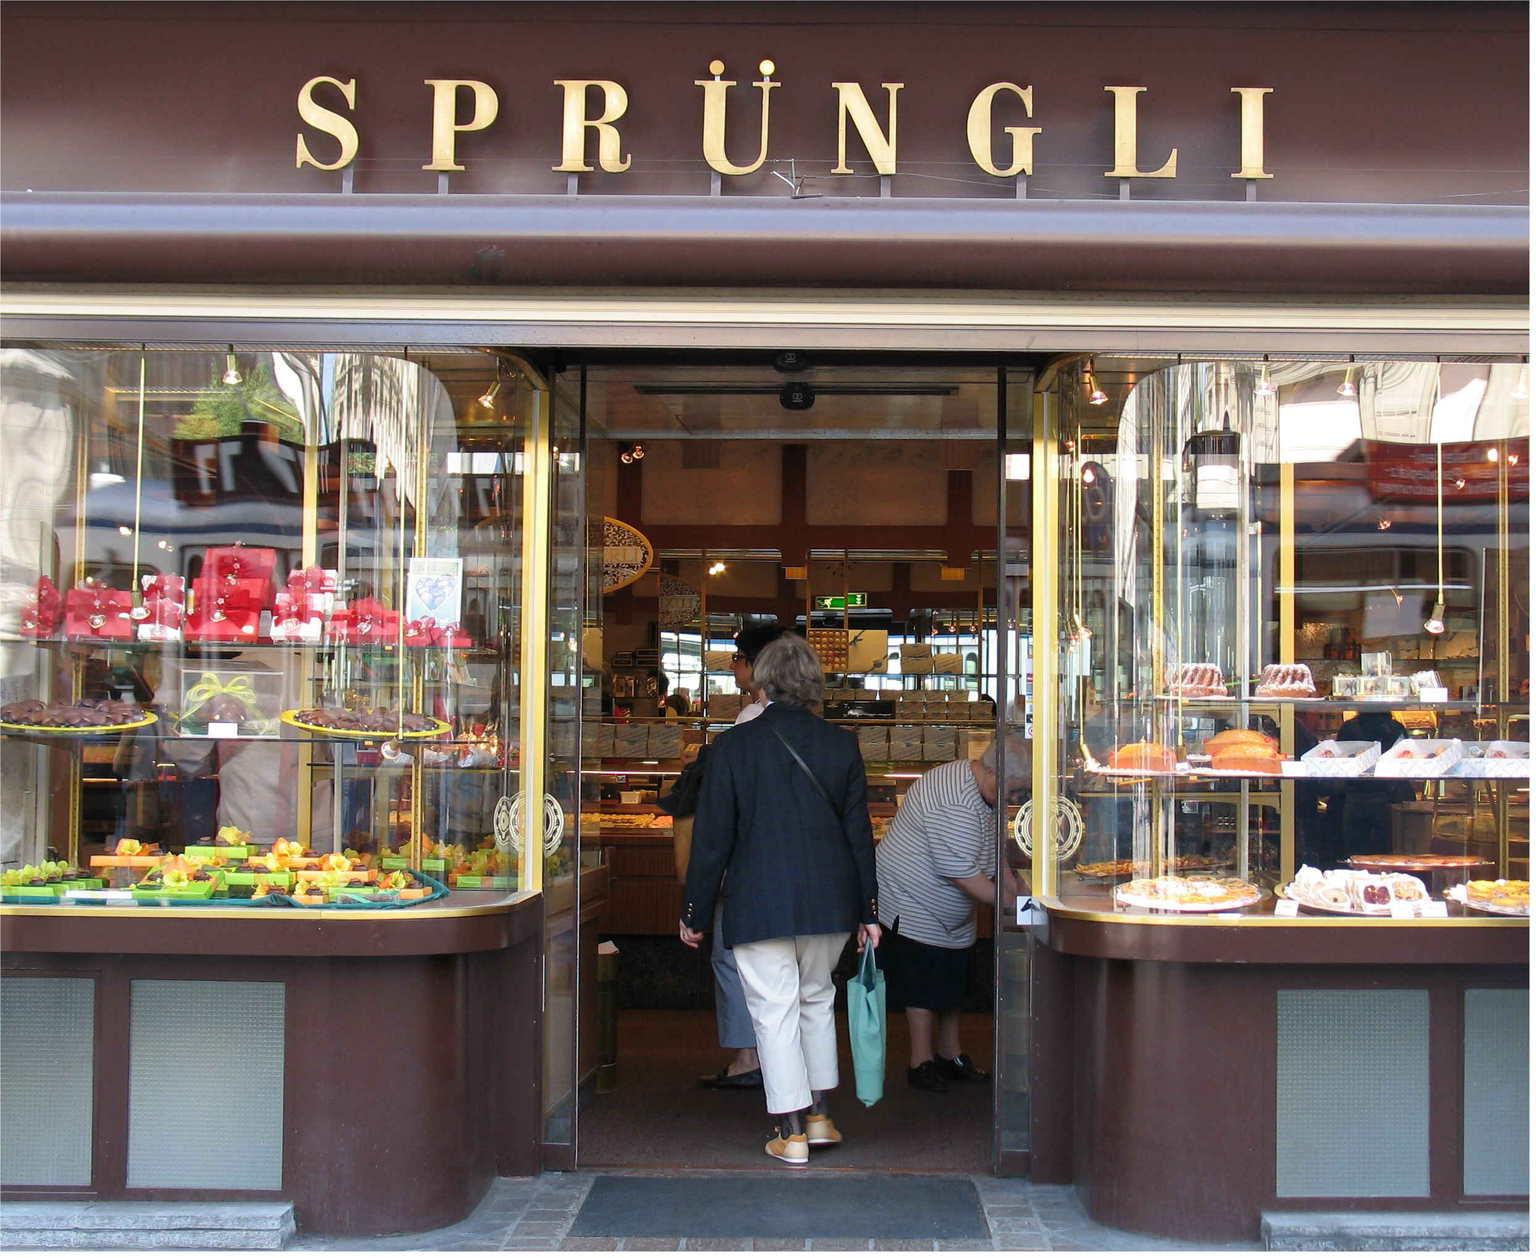 Lindt & Sprüngli Chocolate Factory